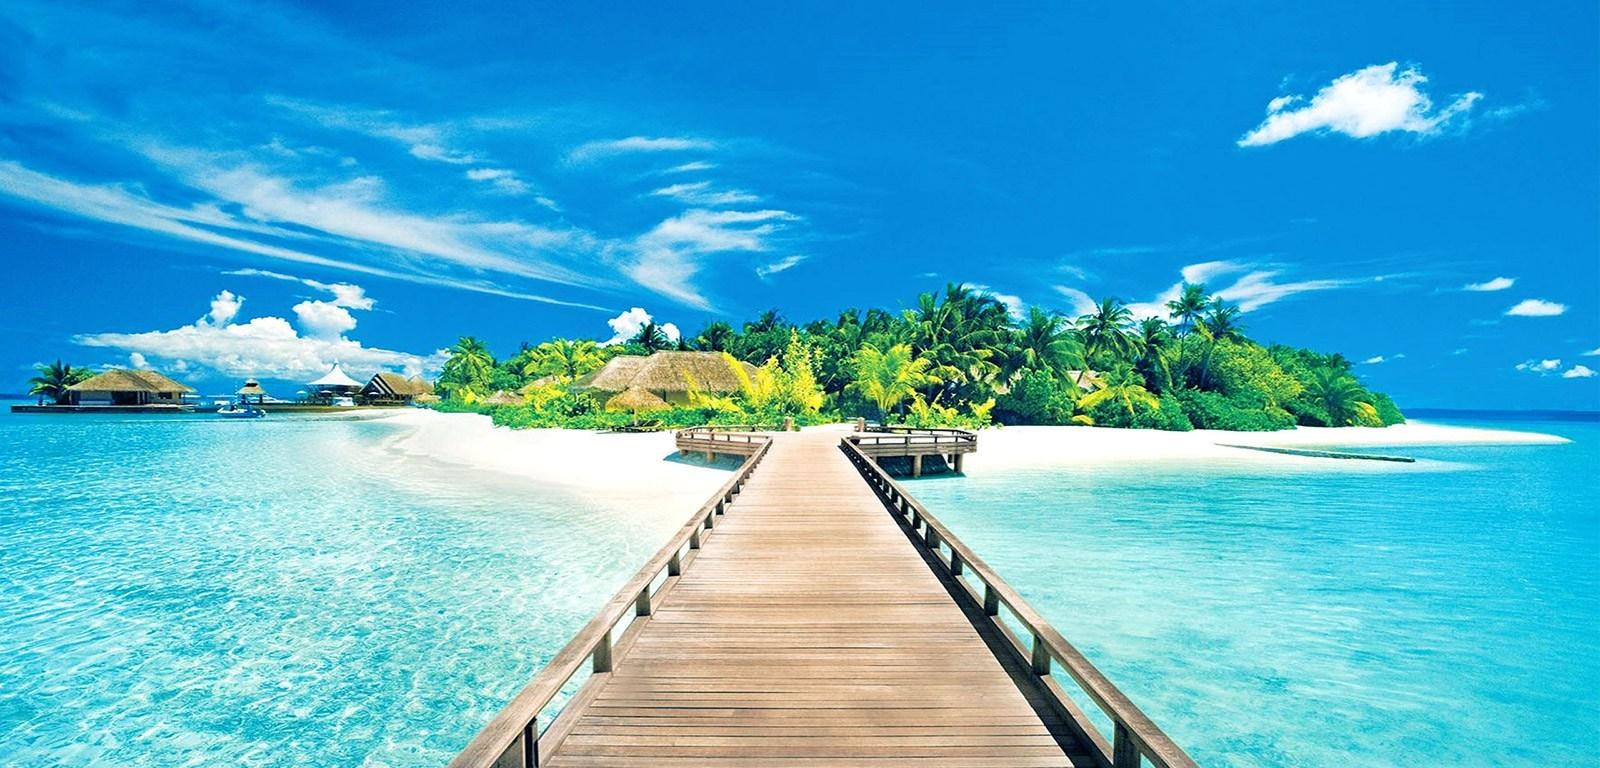 Wisata Indonesia Pulau